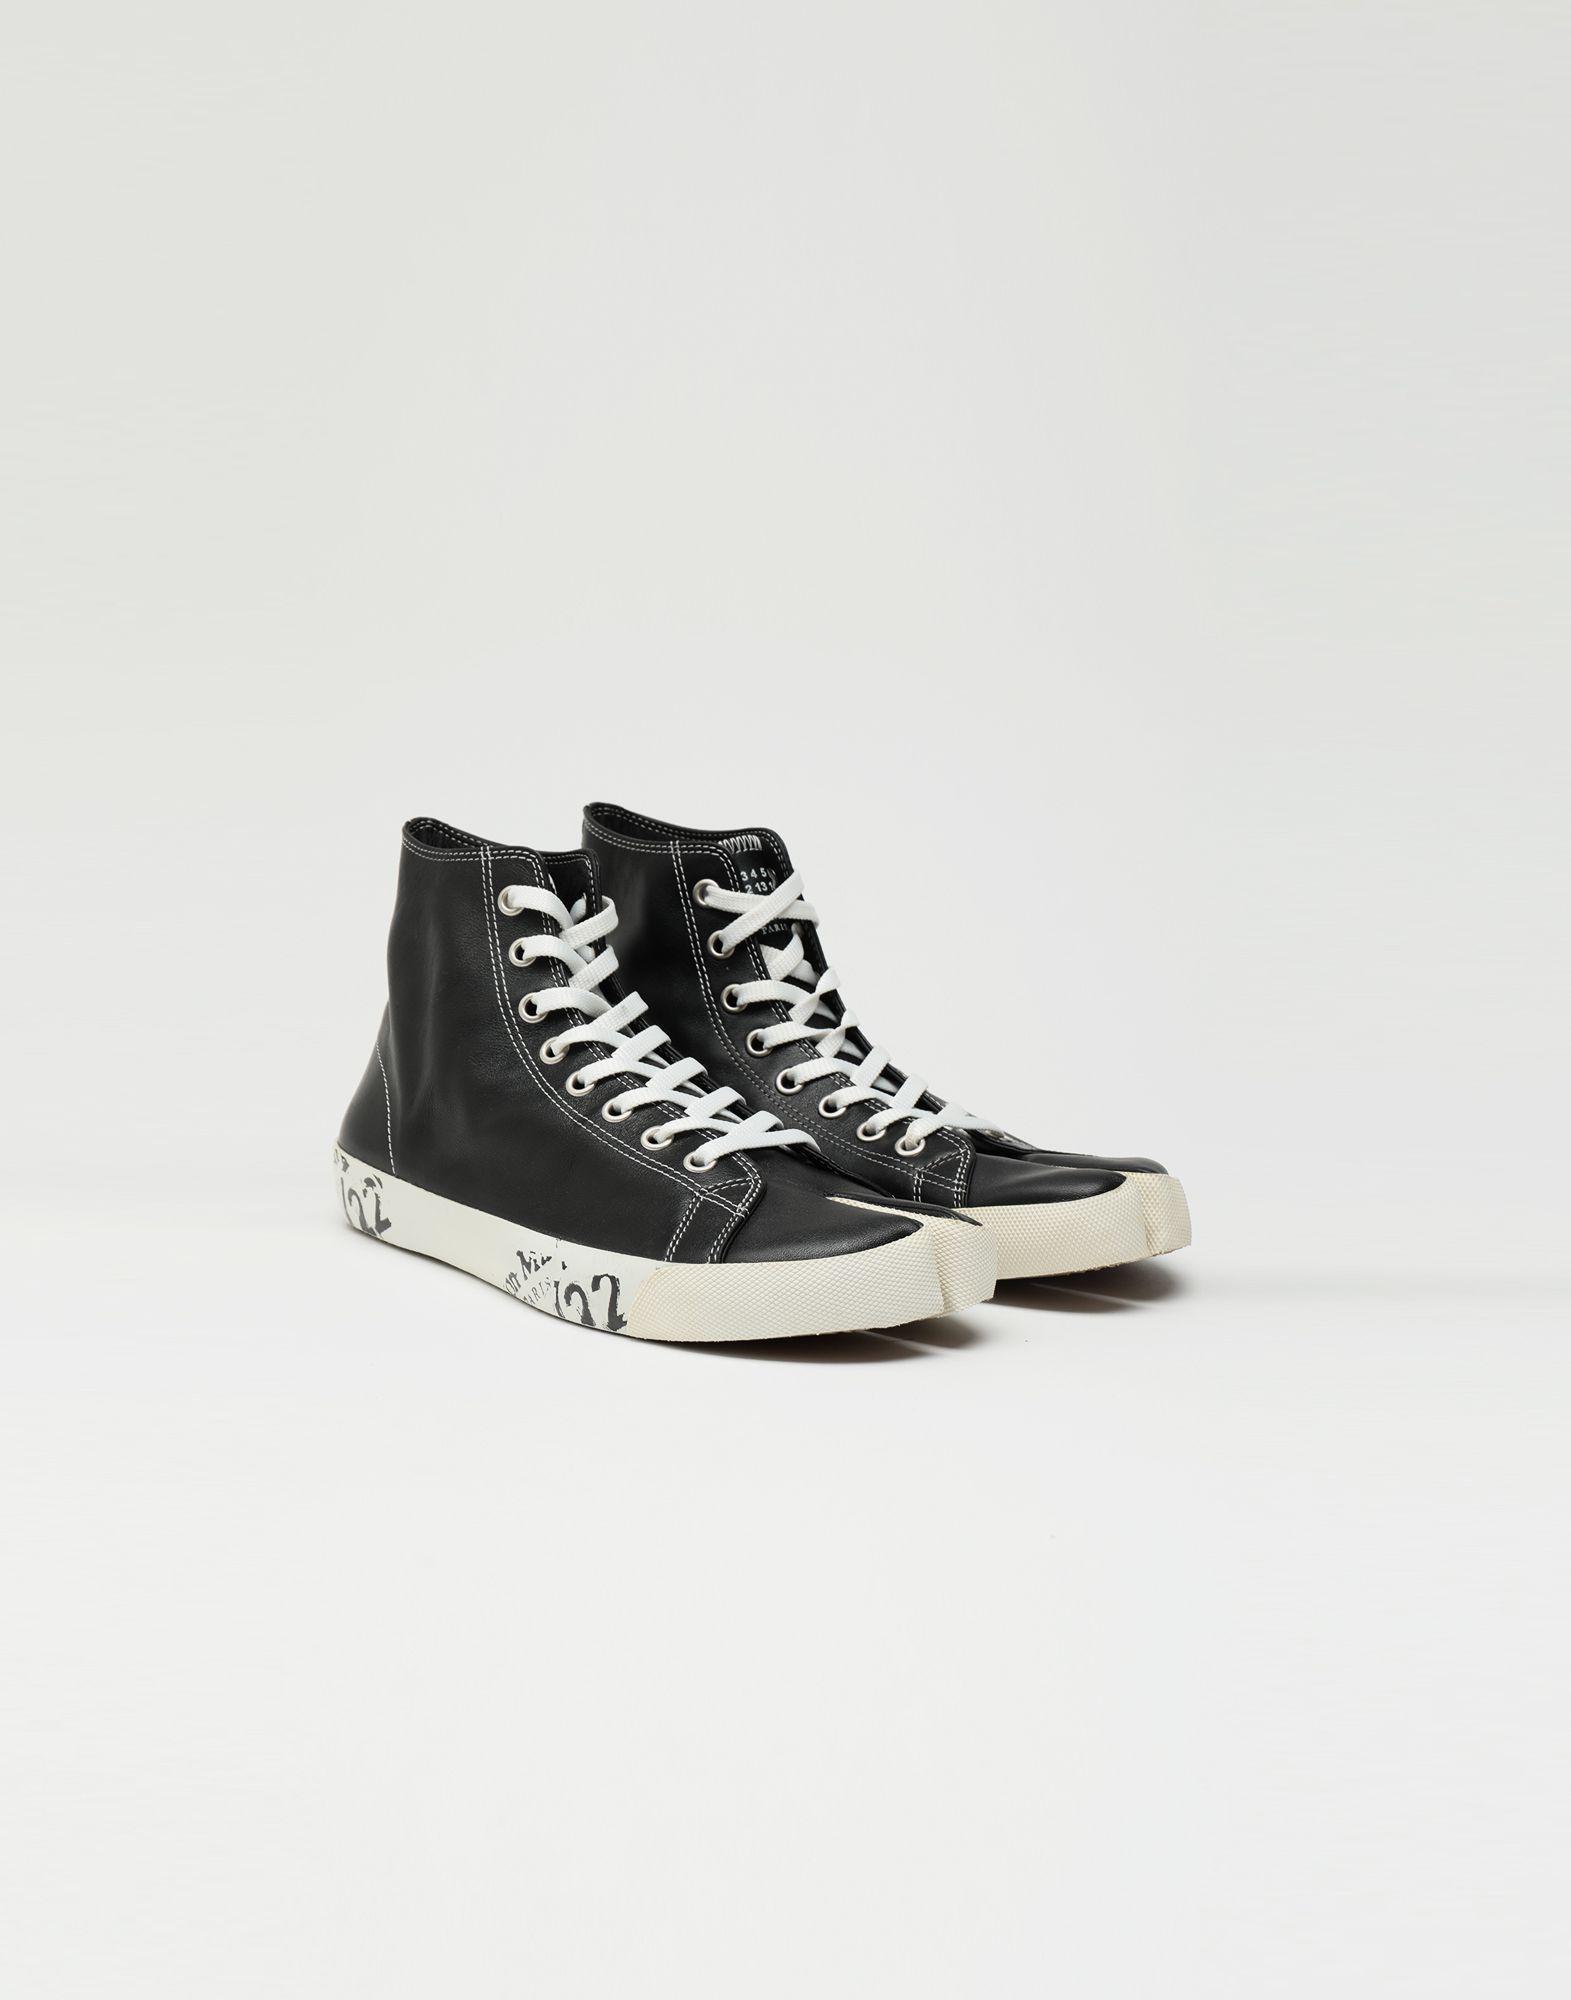 MAISON MARGIELA Tabi high top leather sneakers Sneakers Tabi Man r